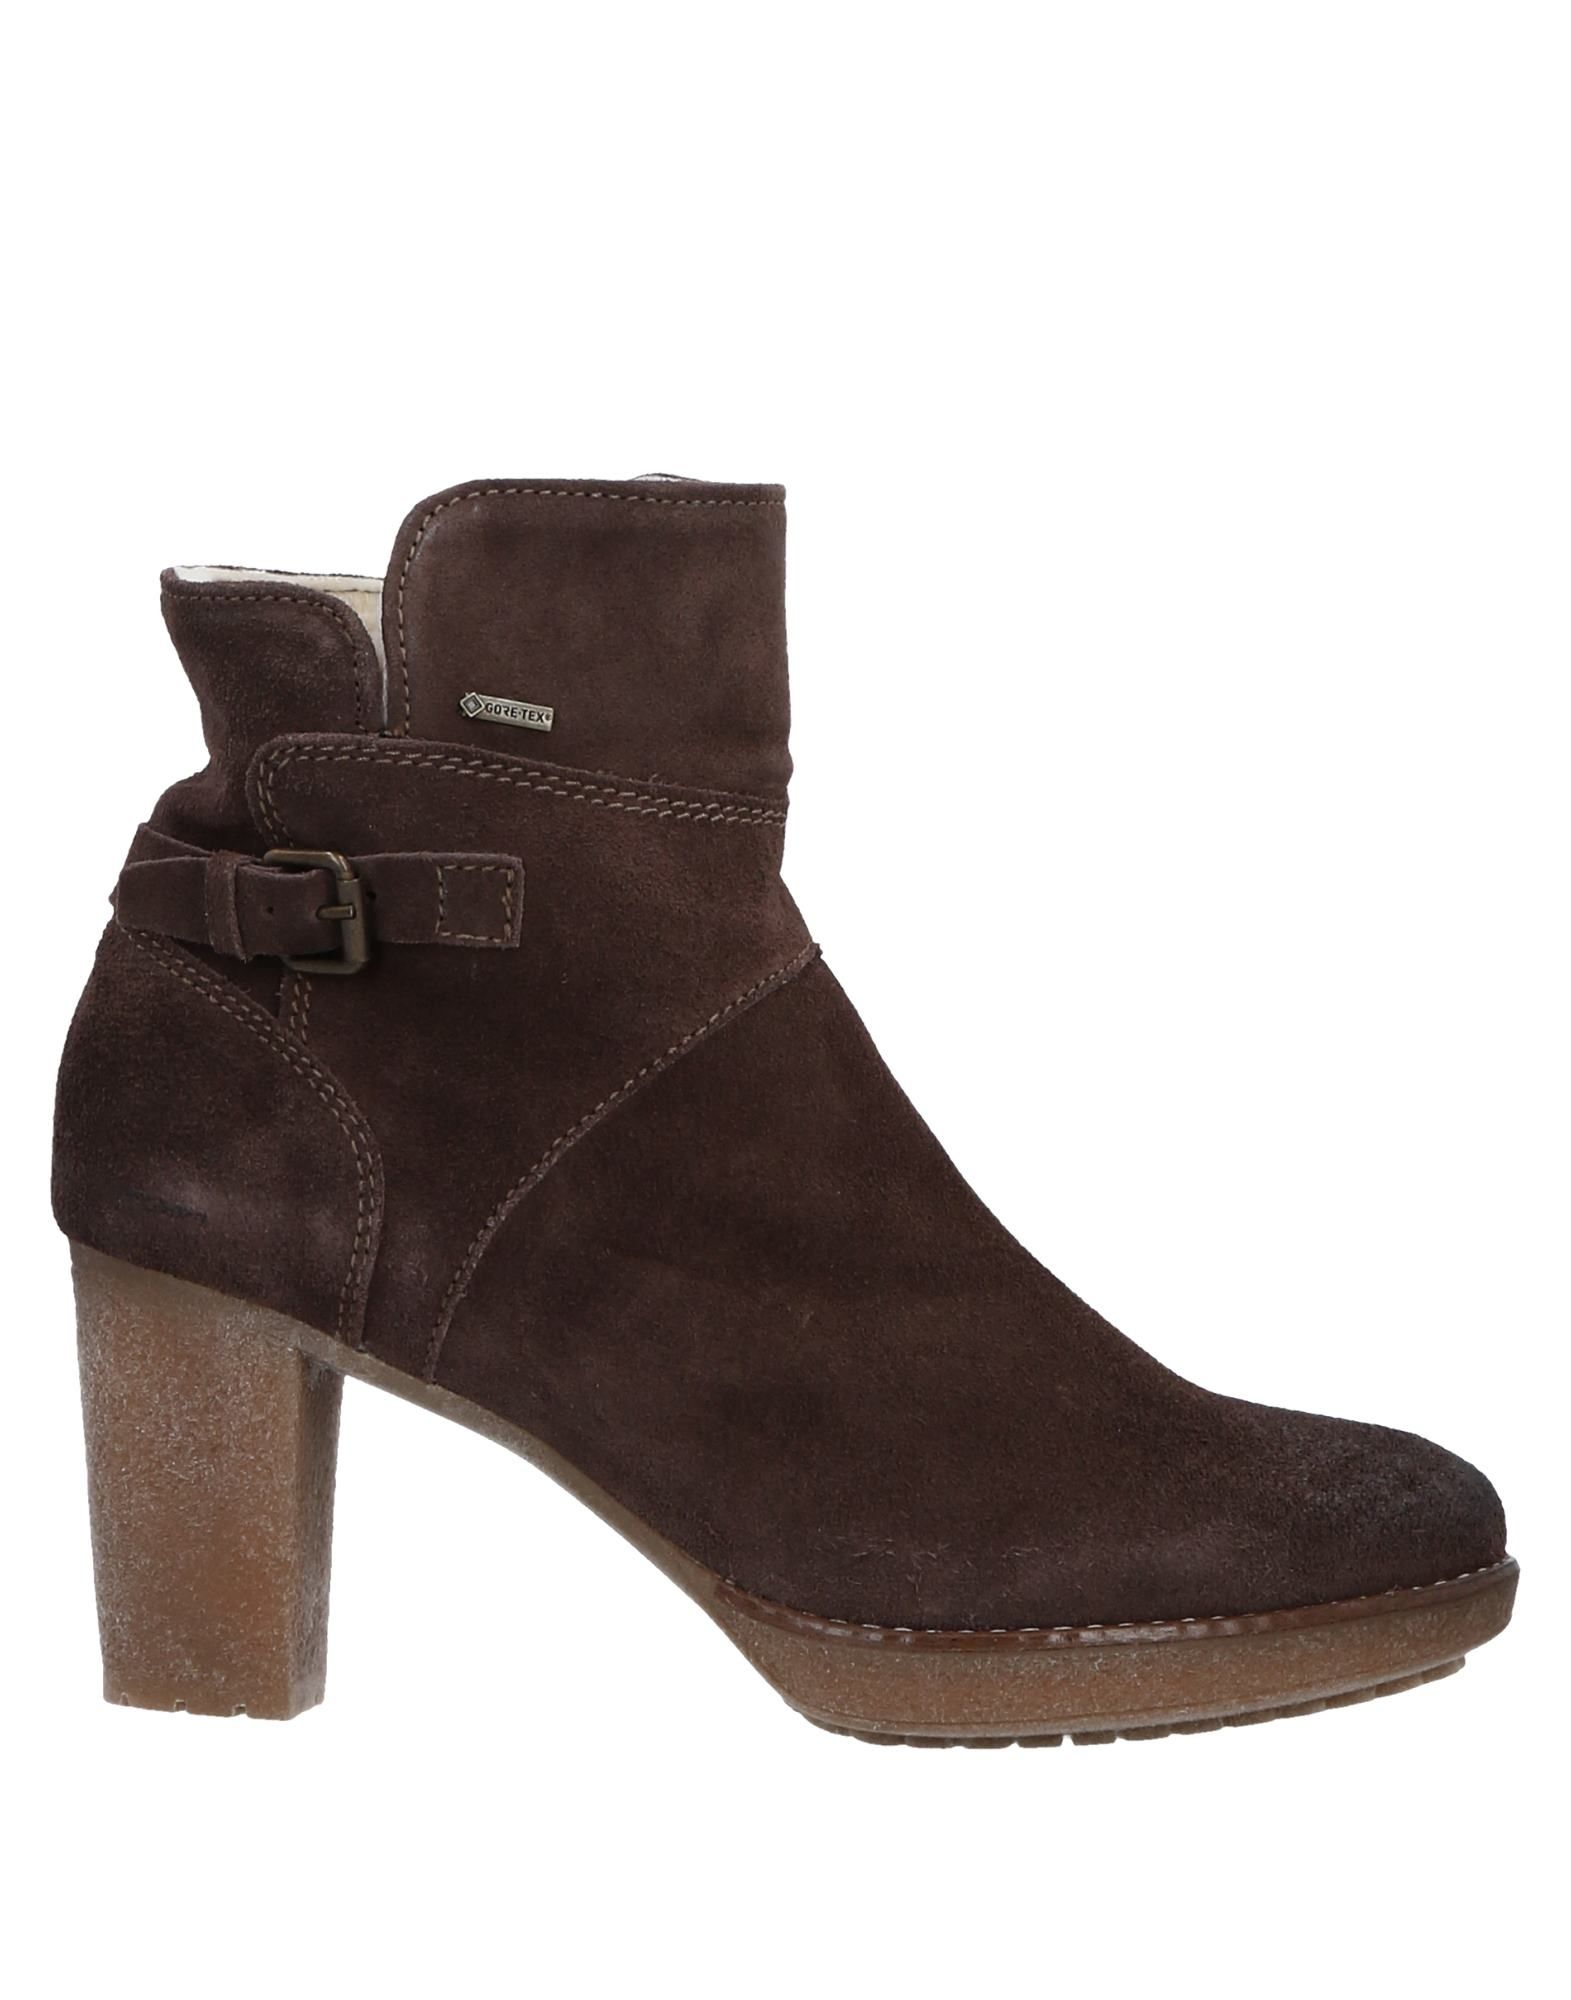 Stilvolle billige Schuhe 11512957DV Manas Stiefelette Damen  11512957DV Schuhe 393fa0